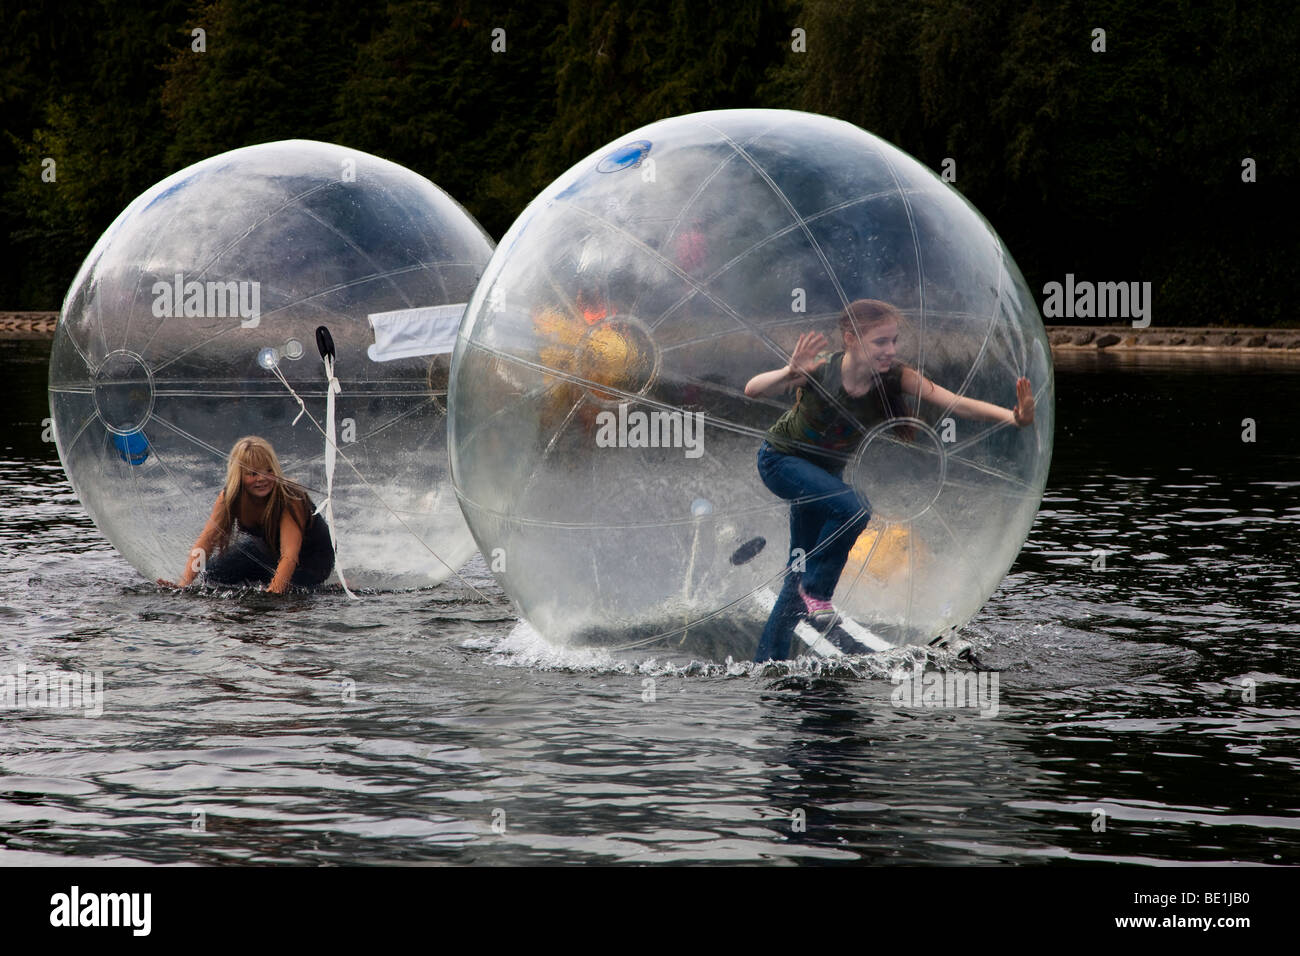 Dos niñas jugando dentro de un bubblerunner a través del lago al público Rouken Glen park, Glasgow, Imagen De Stock